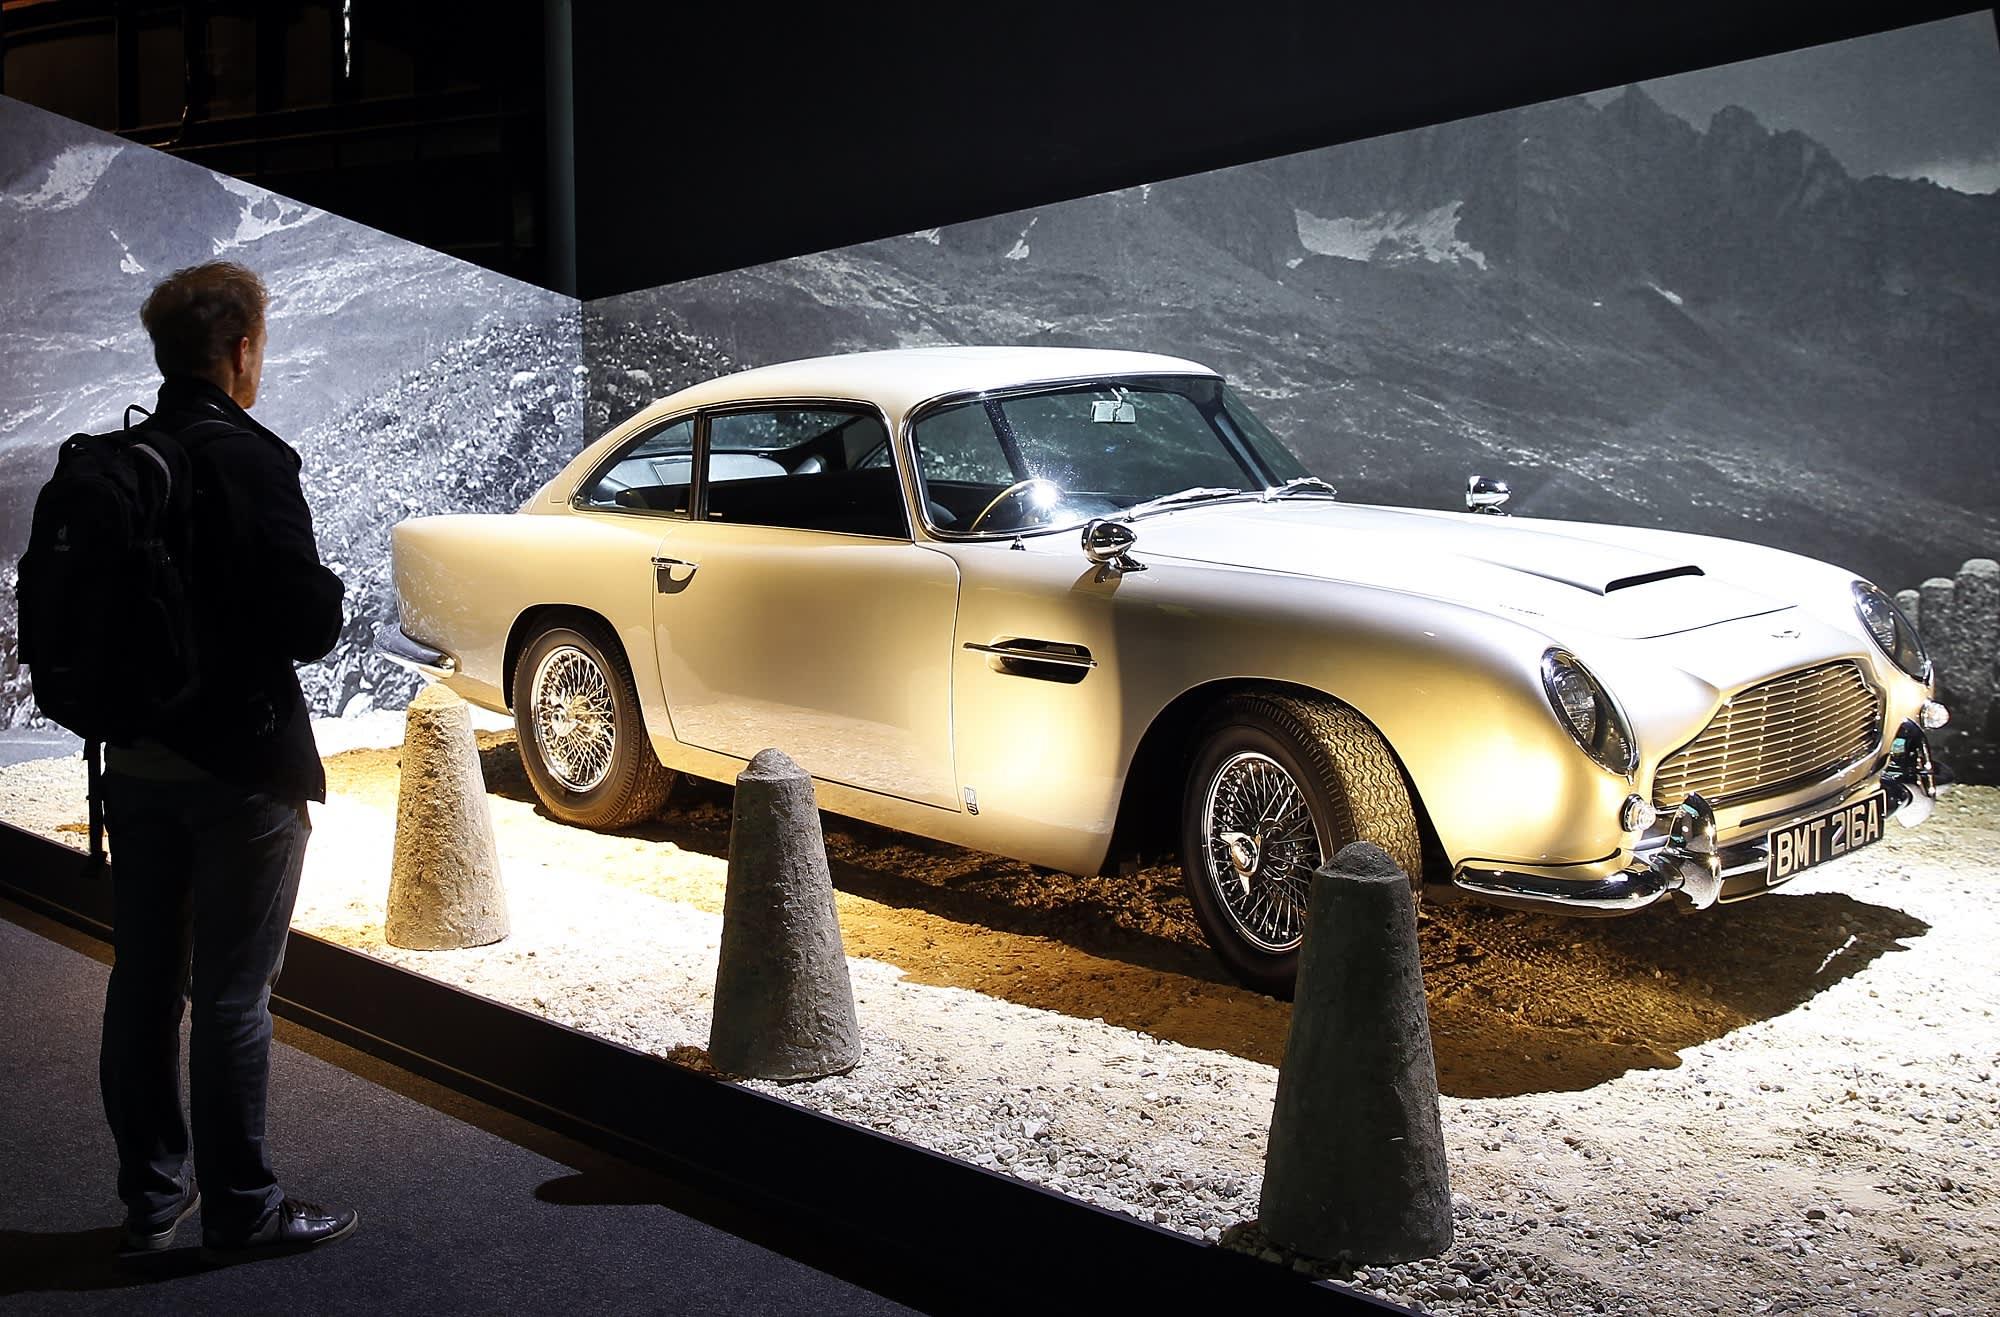 Photos Aston Martin Recreating Db5 Car From James Bond Films